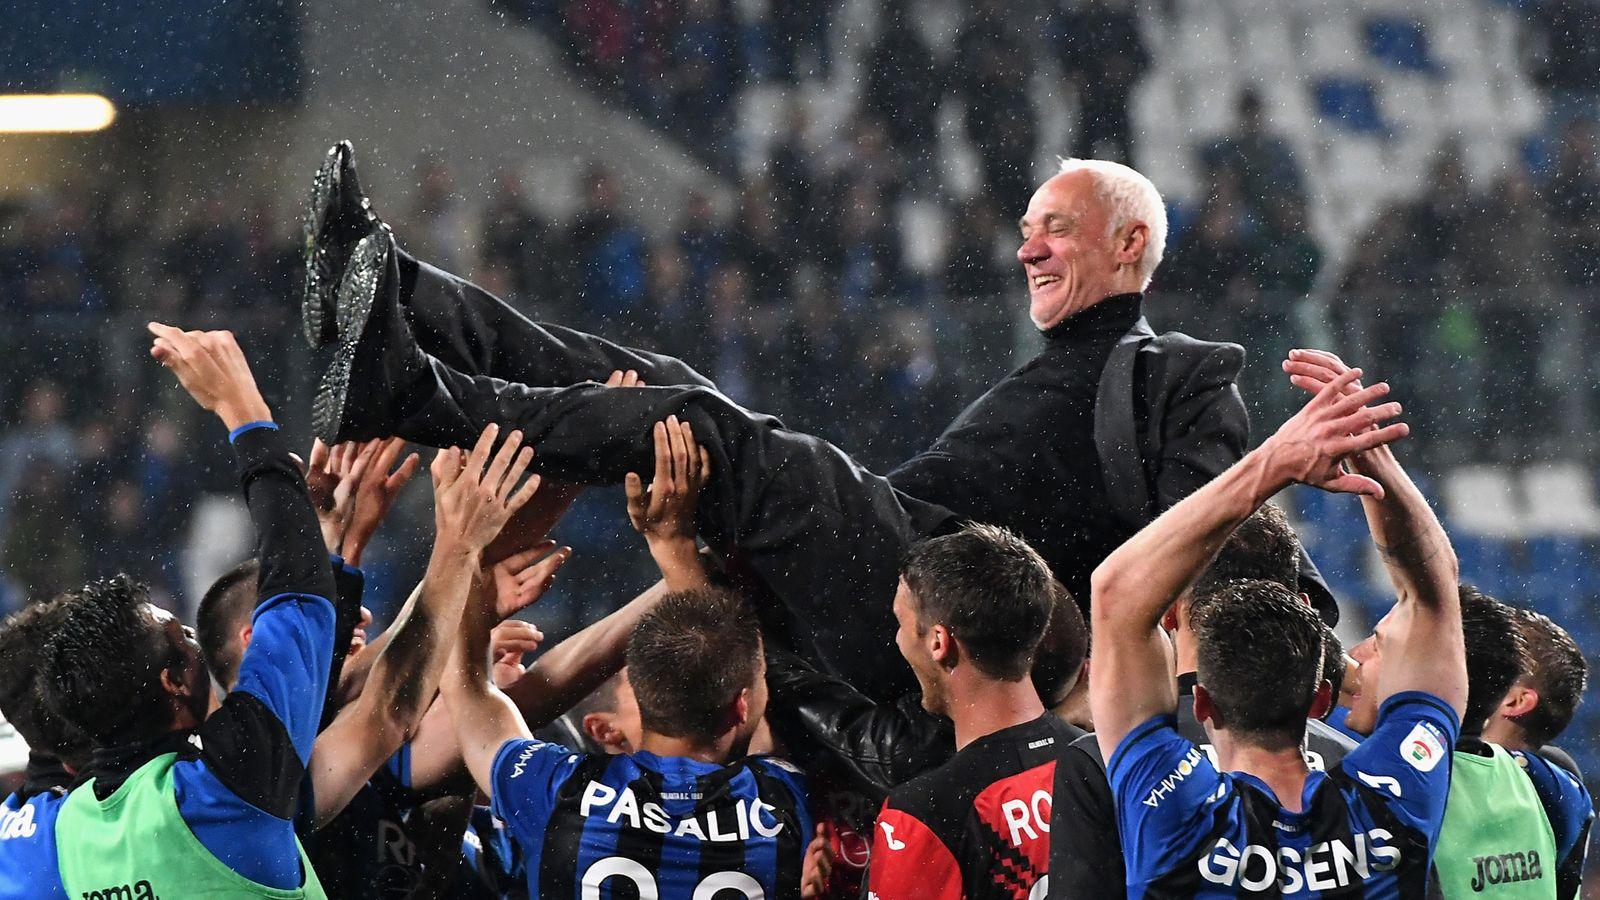 Atalanta 3 - 1 Sassuolo - Match Report & Highlights